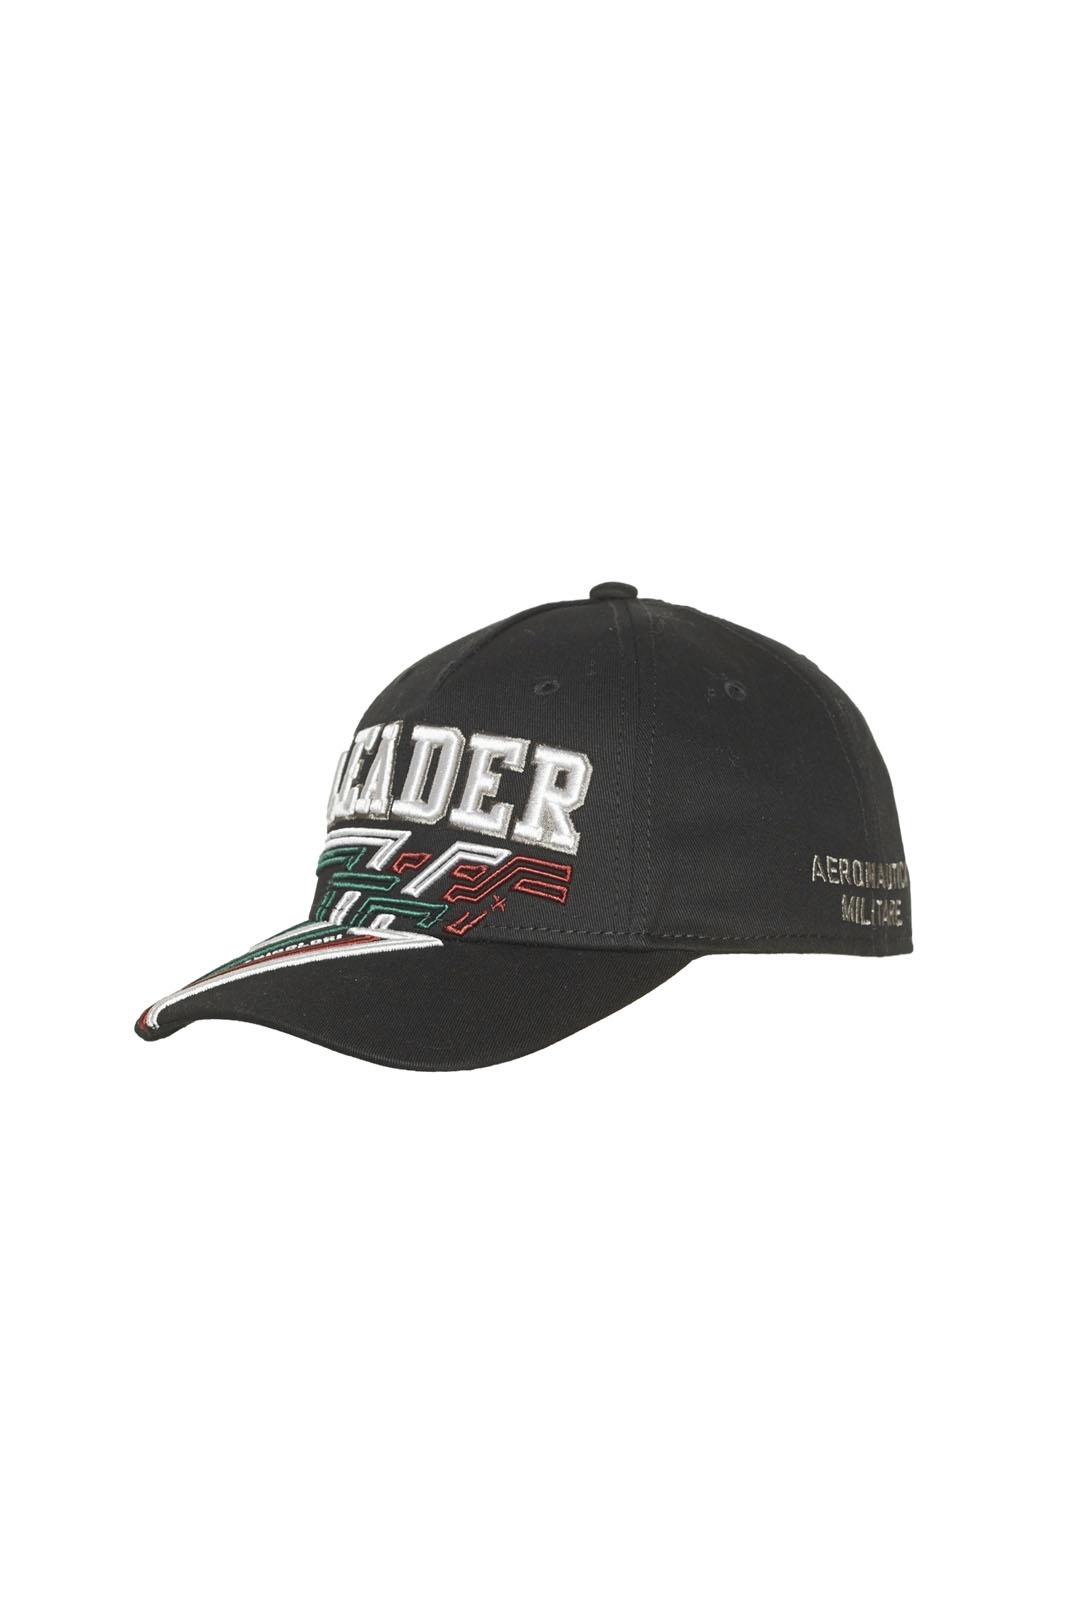 Embroidered Leader baseball hat          2